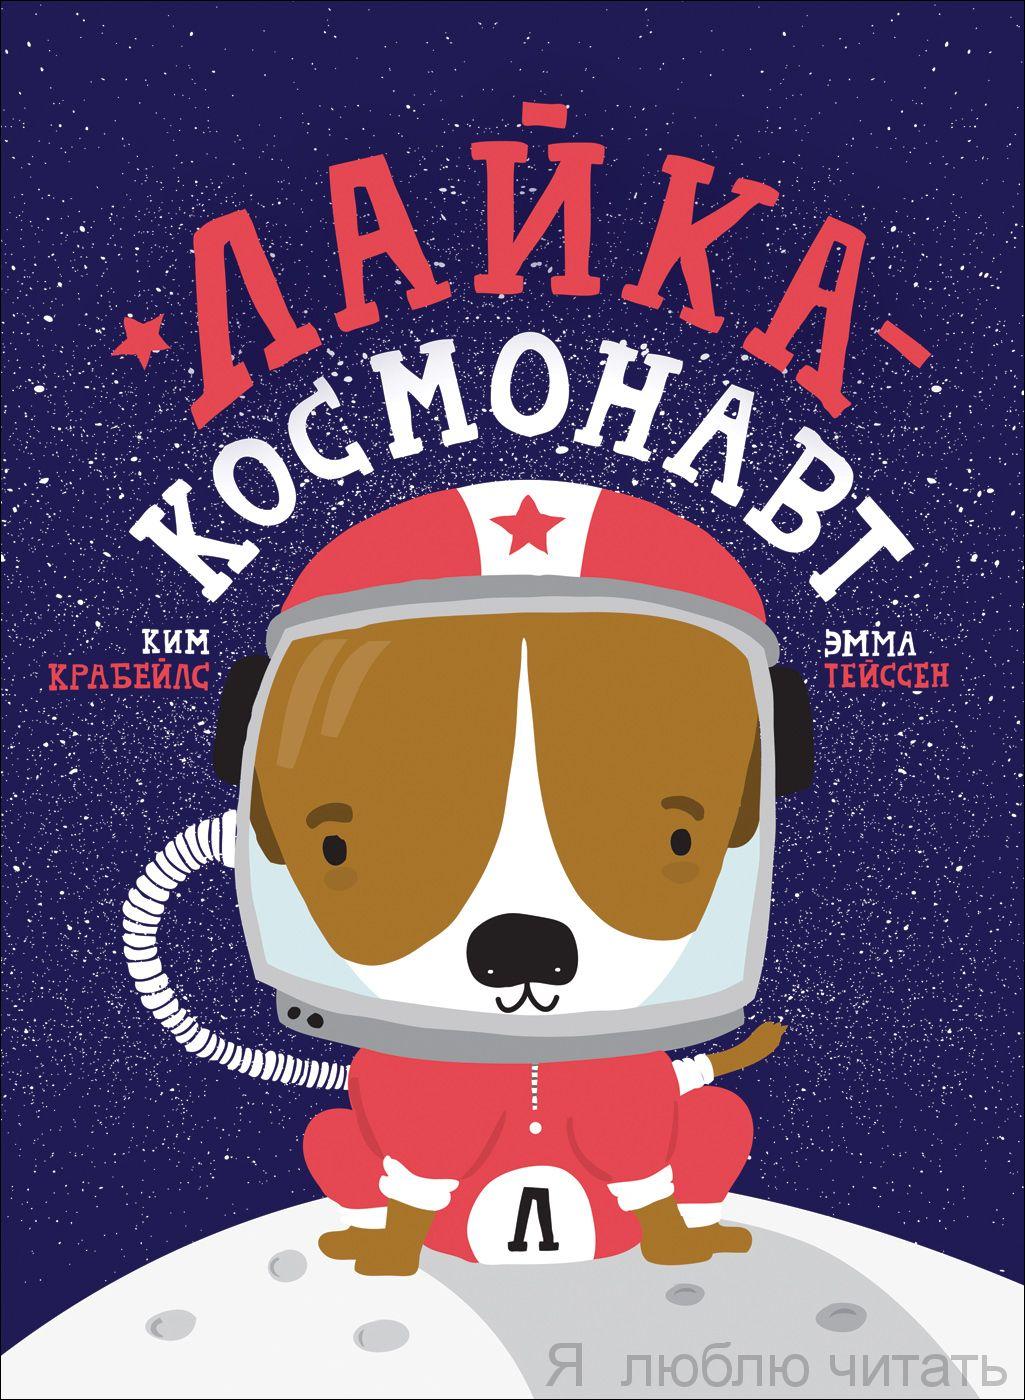 Лайка - космонавт